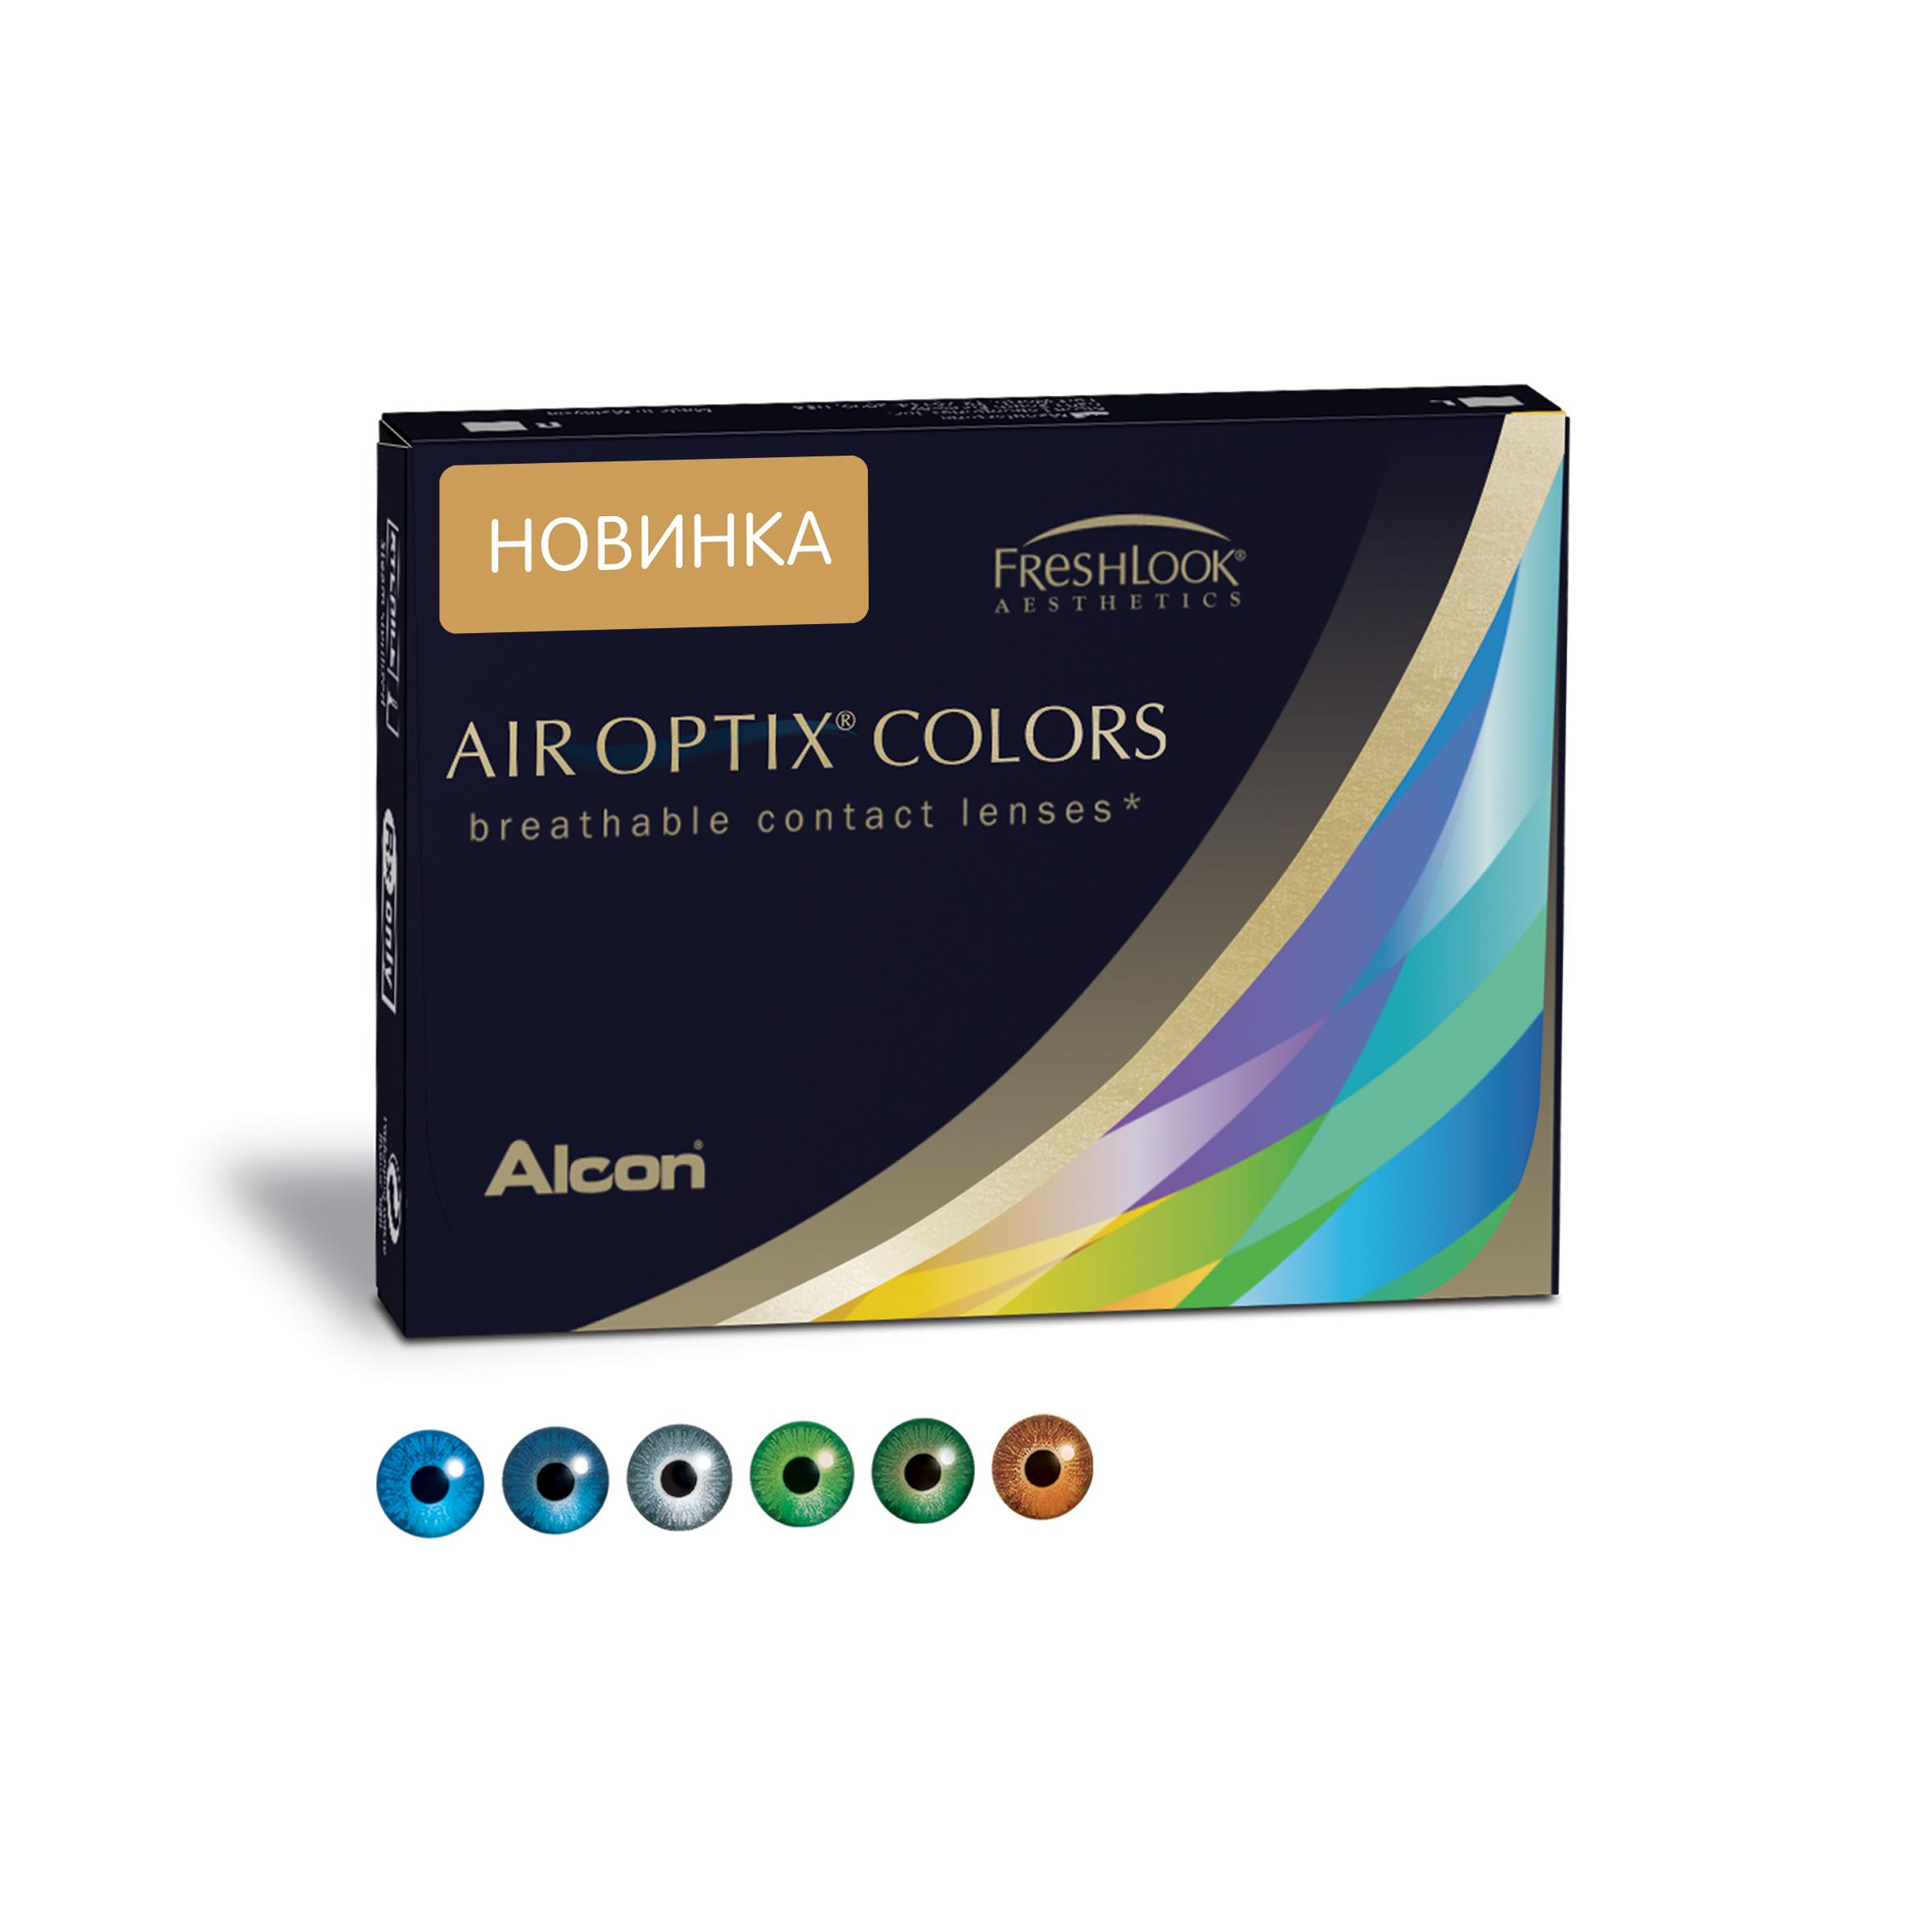 Аlcon контактные линзы Air Optix Colors 2 шт -6.50 Blue ( 31746310 )